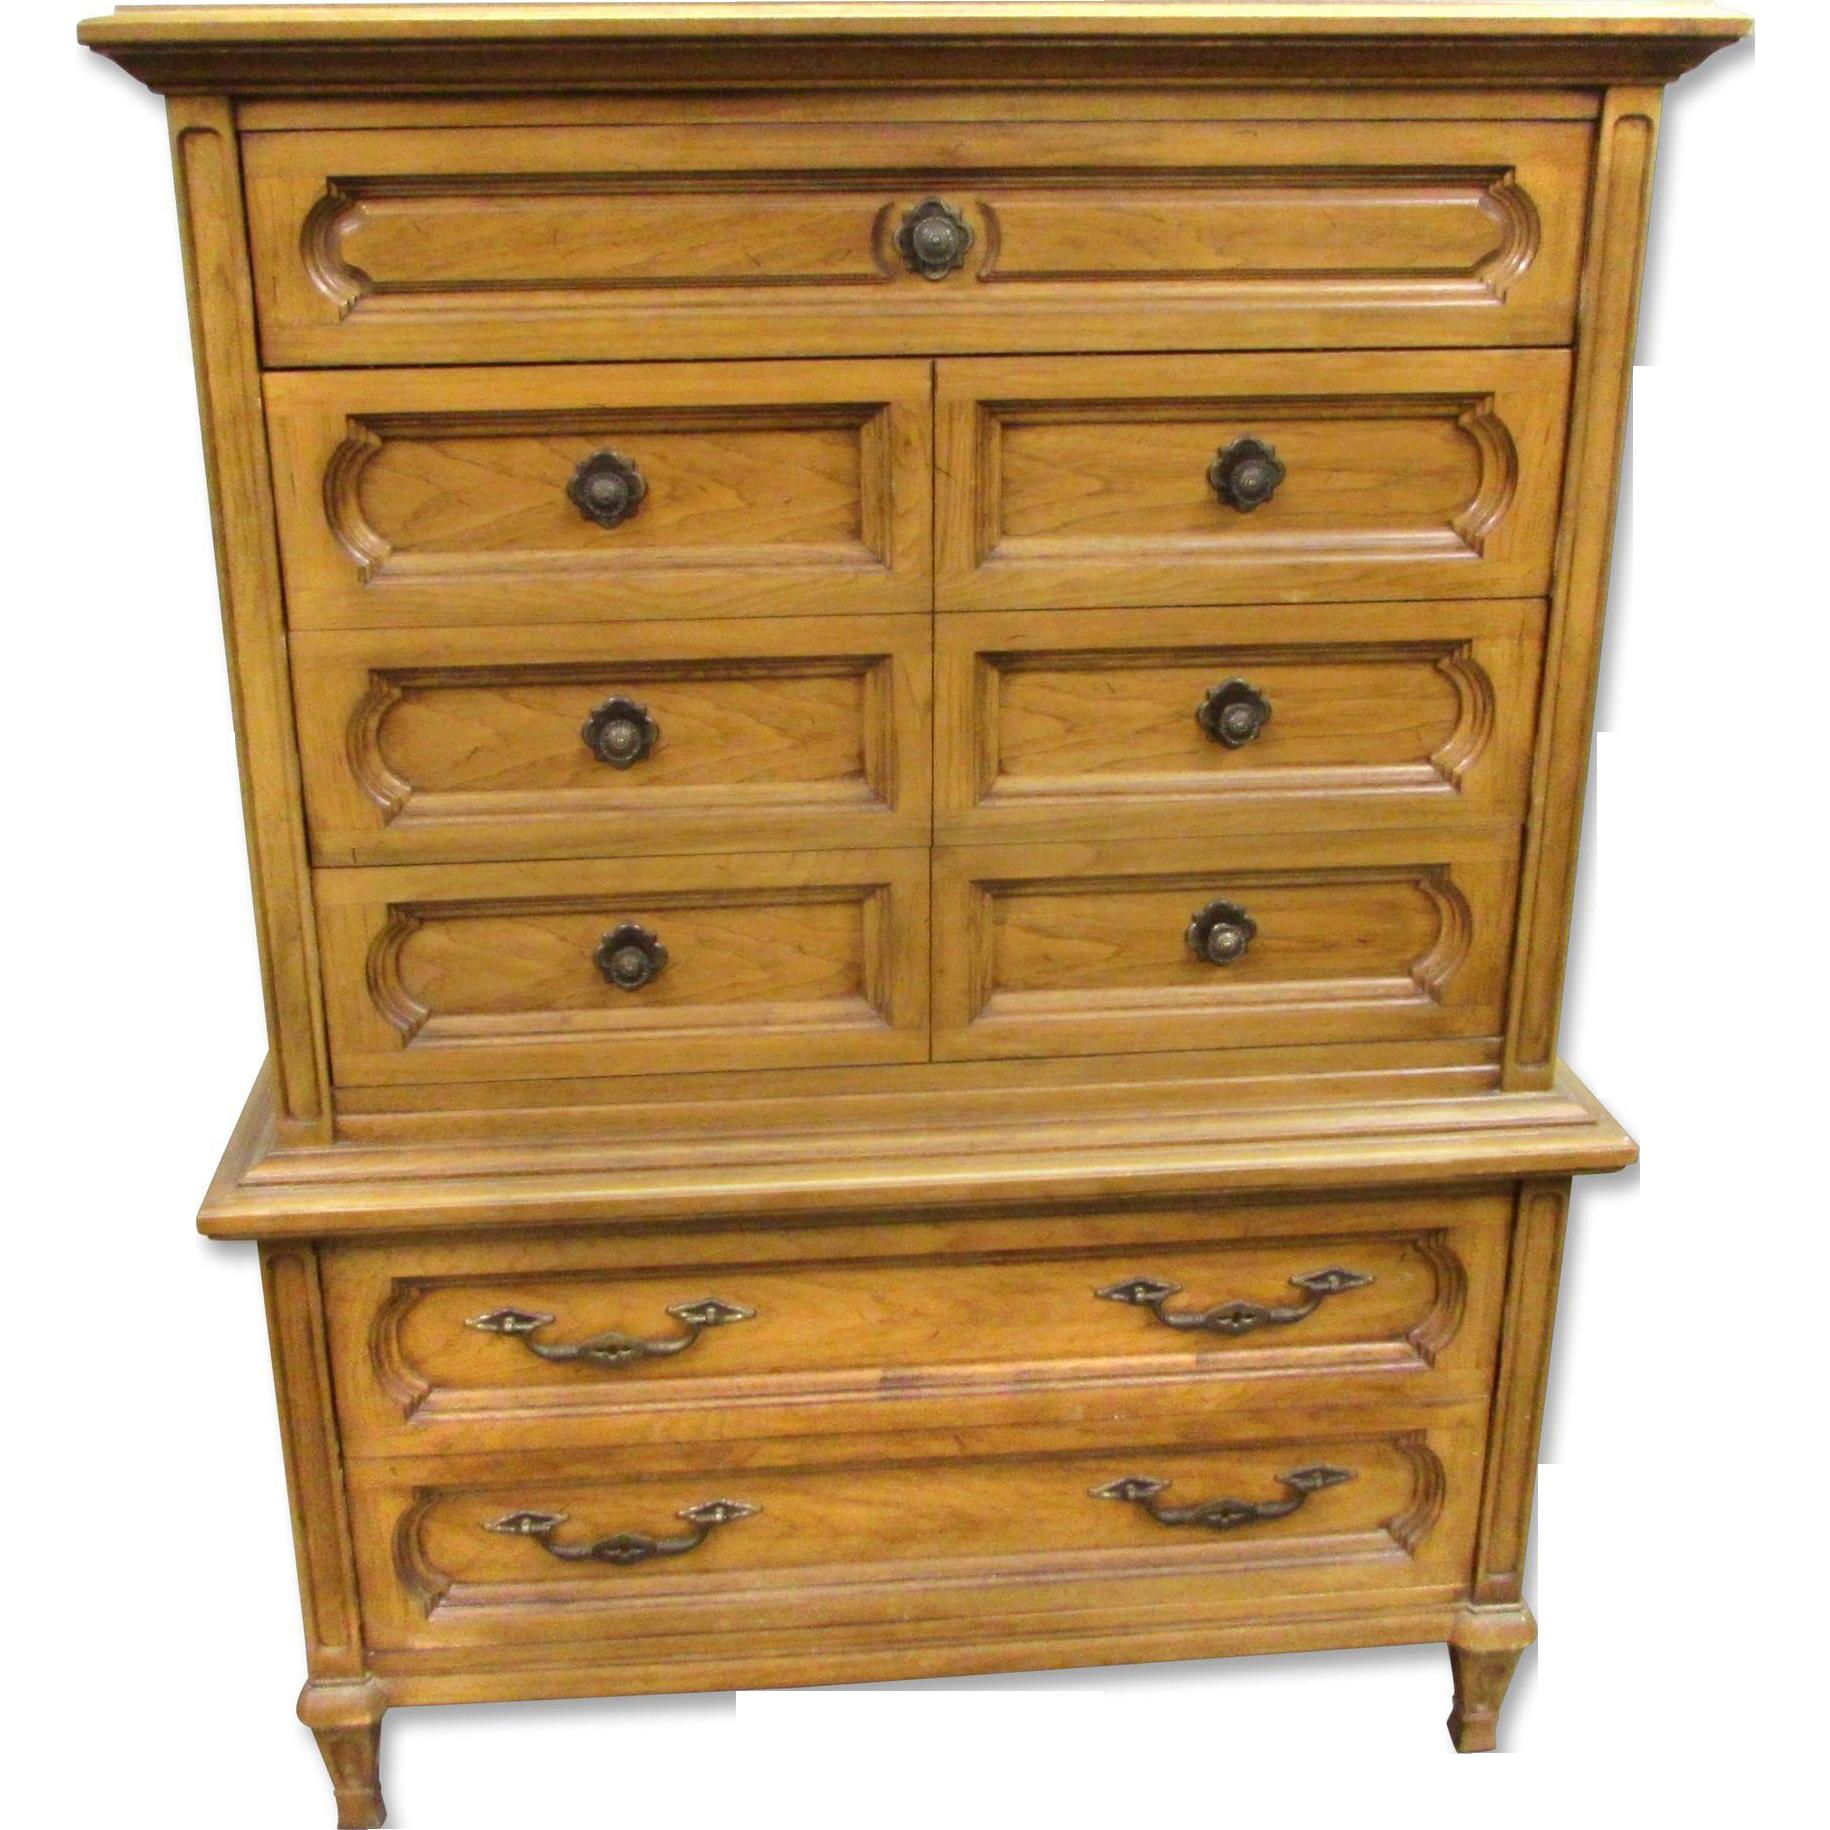 Tall Thomasville dresser